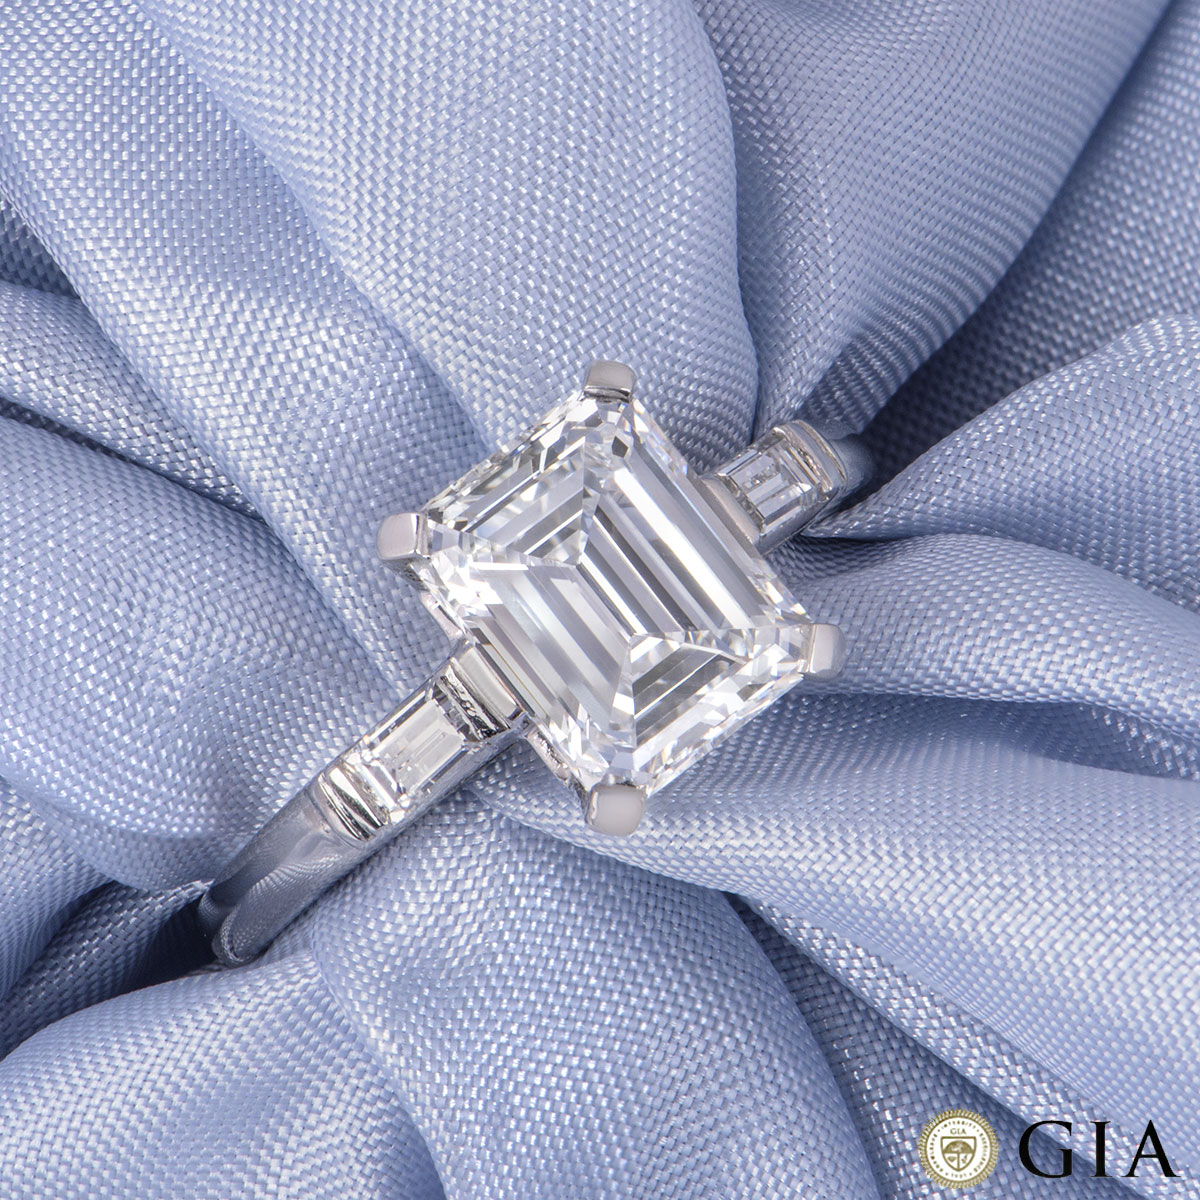 Platinum Emerald Cut Diamond Ring 1.92ct F/VVS2